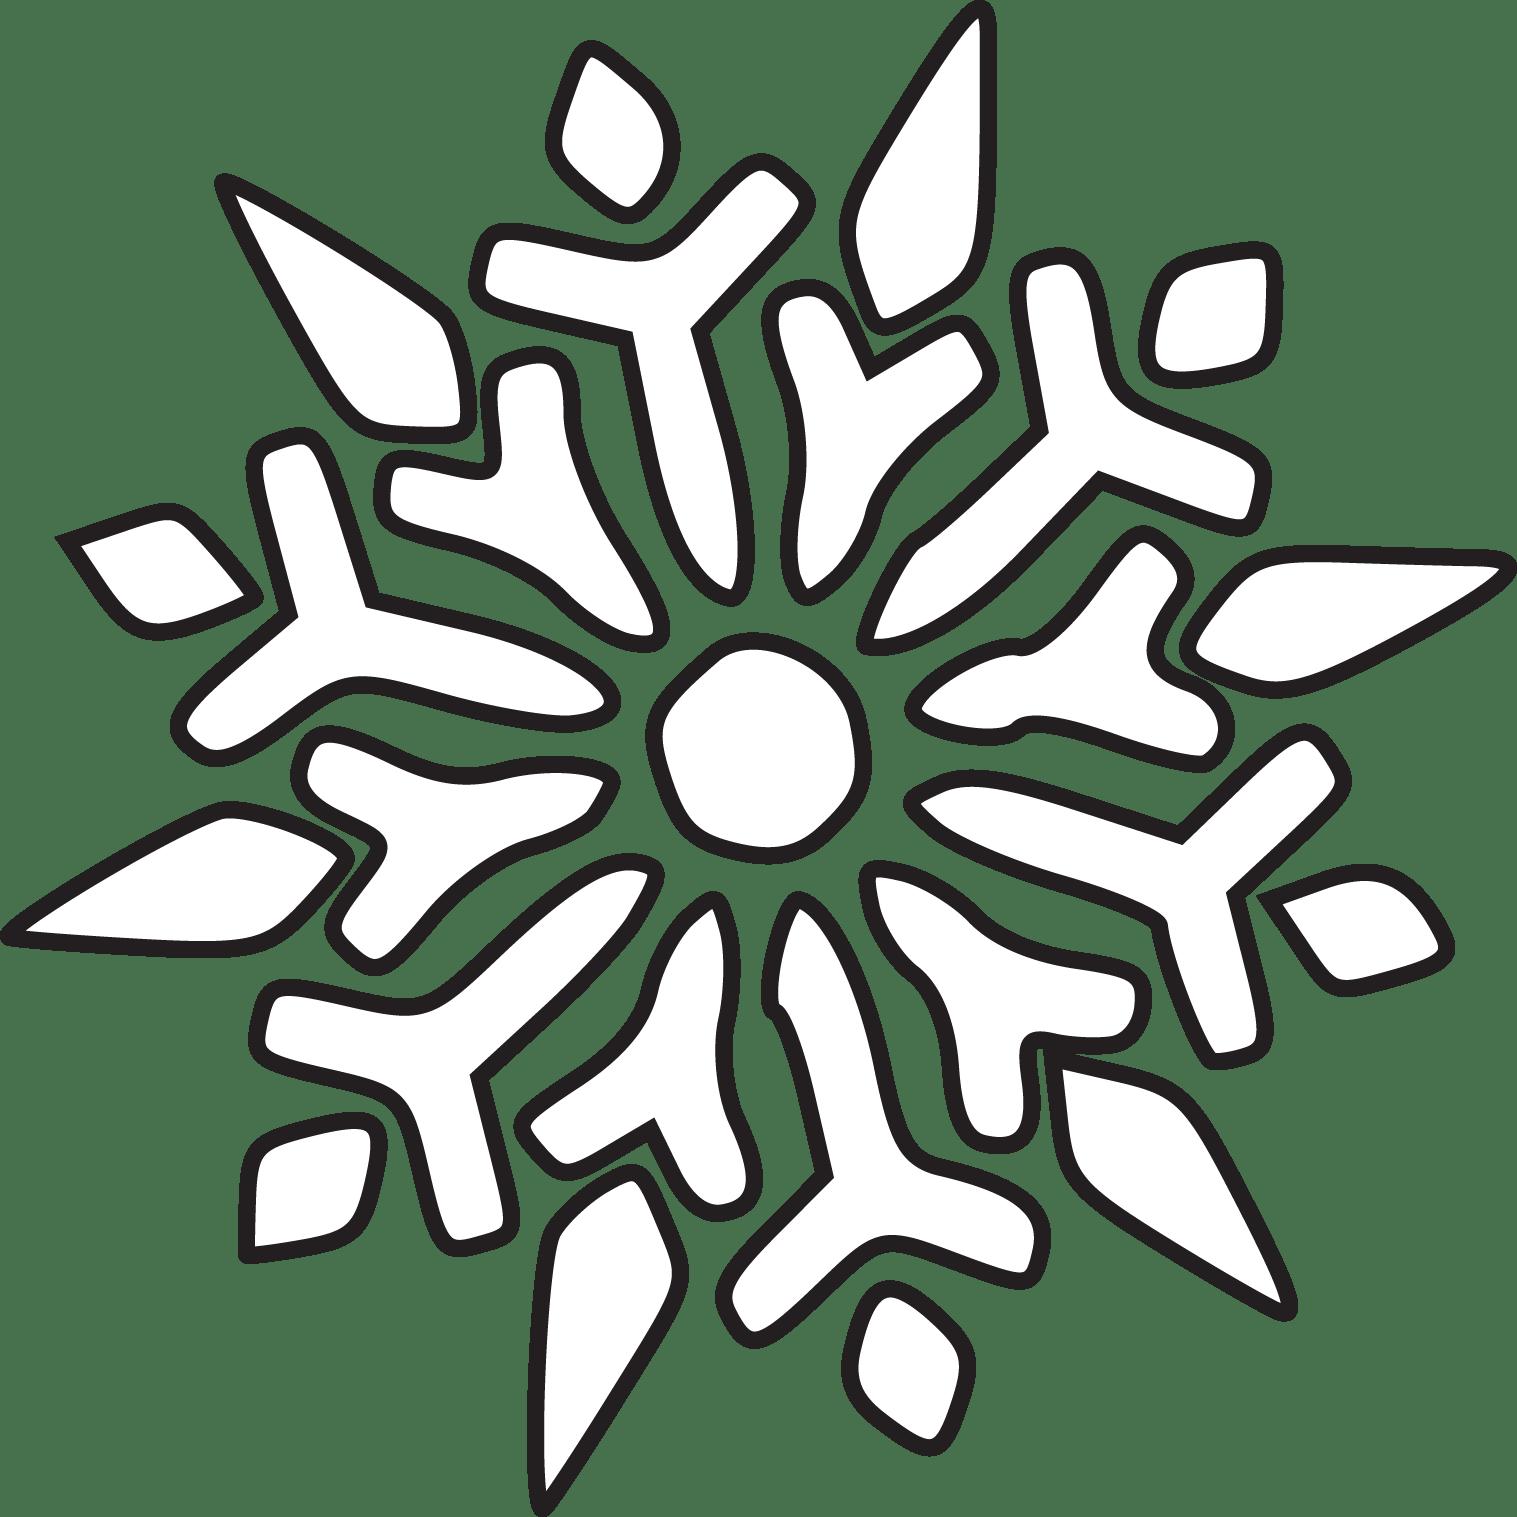 Snowflake Line Drawing